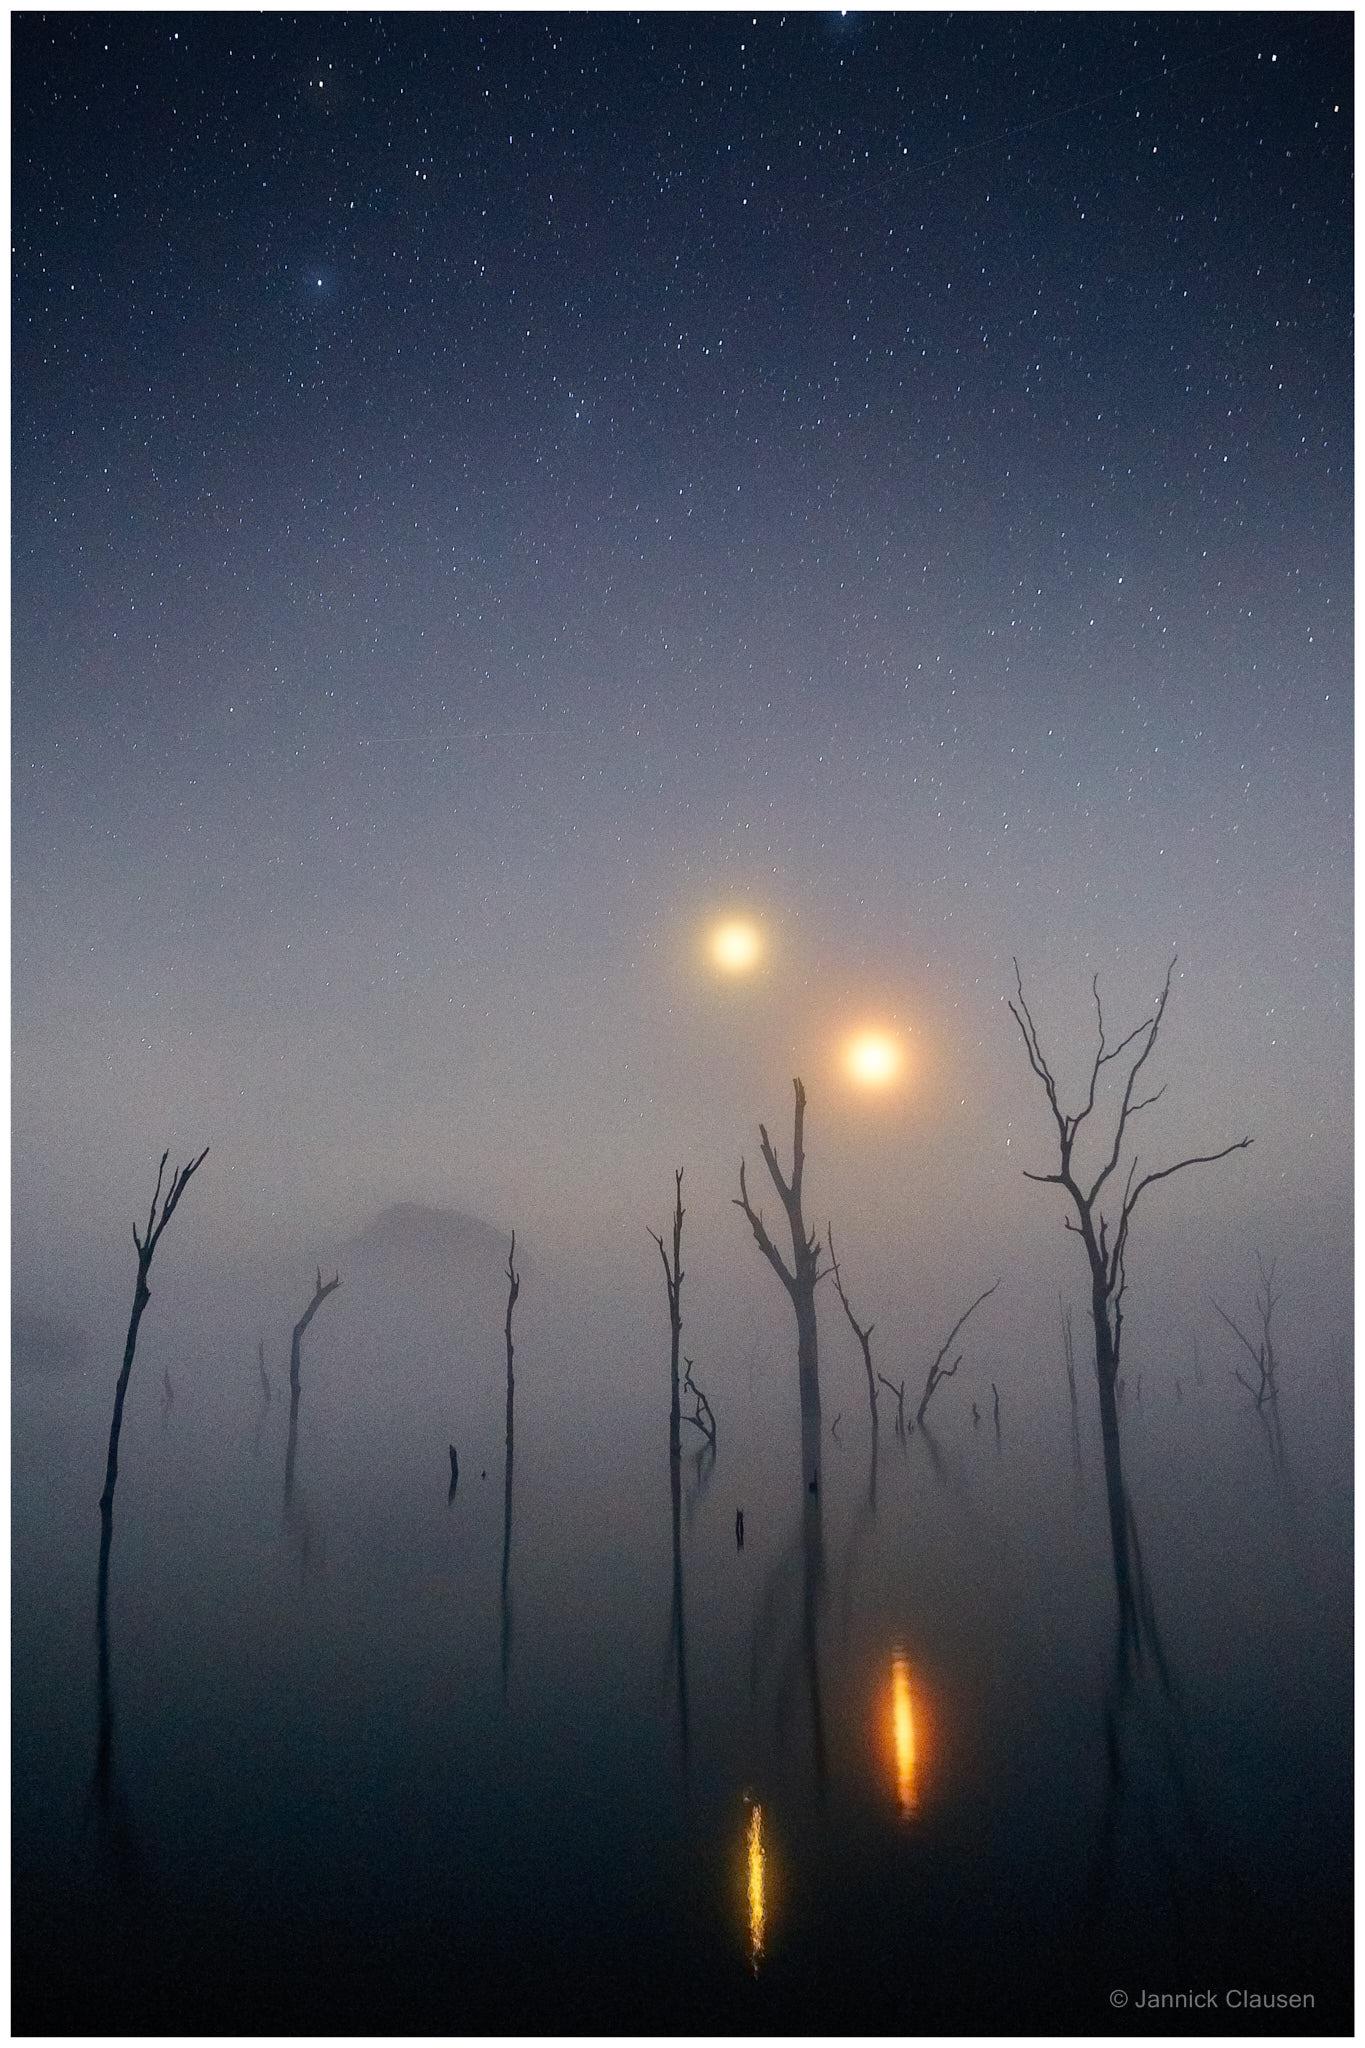 Fine_ Art_Landscape_Photography_Jannick_Clausen_Jul 28 2018.jpg